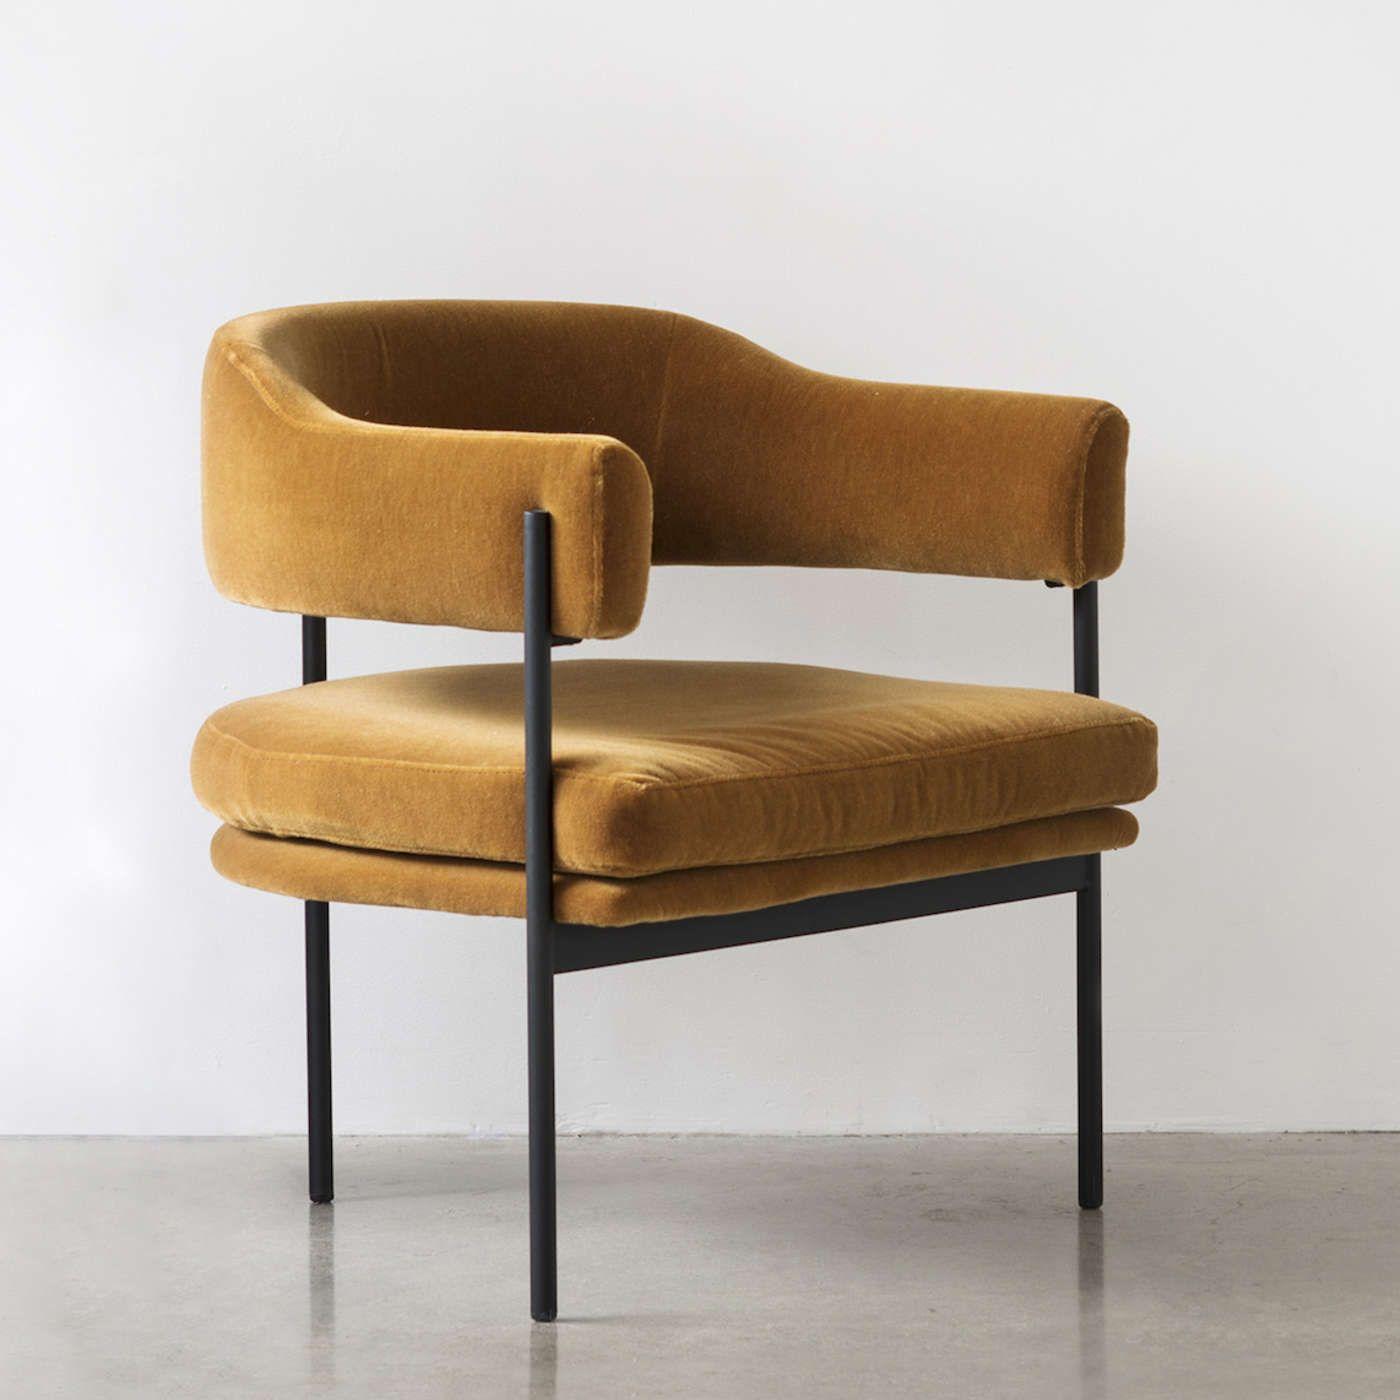 Isabella Chair Simon James Design Lounge Chair Design Modern Lounge Chair Design Chair Design